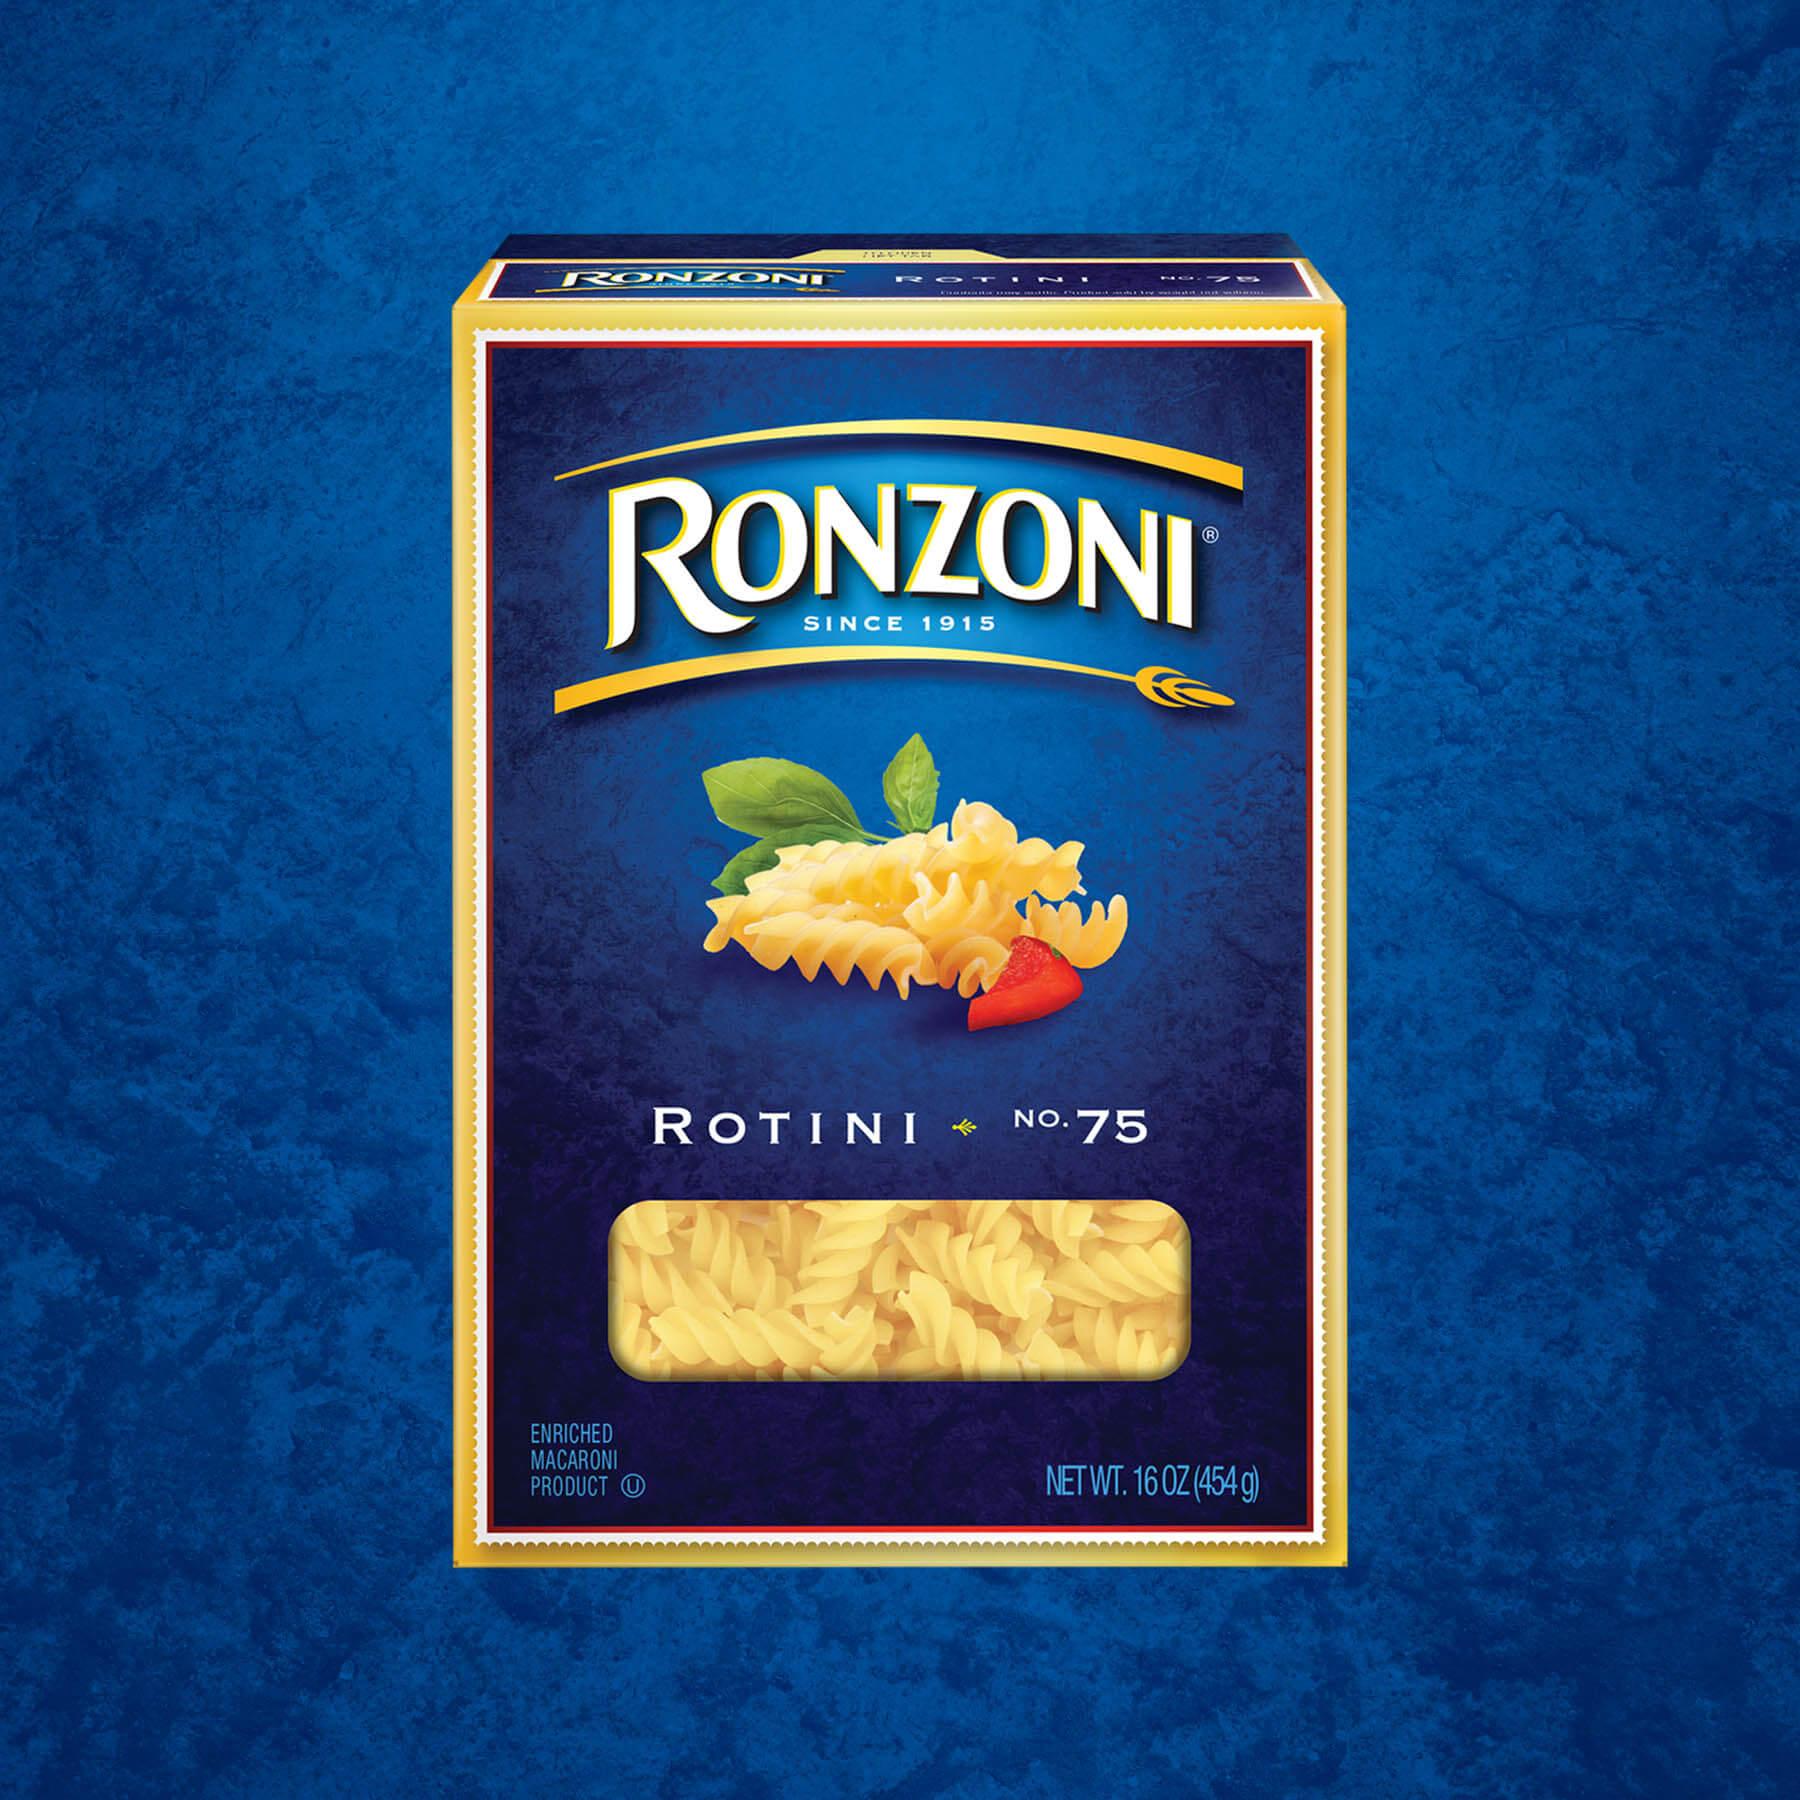 Ronzoni Rotini Package Design